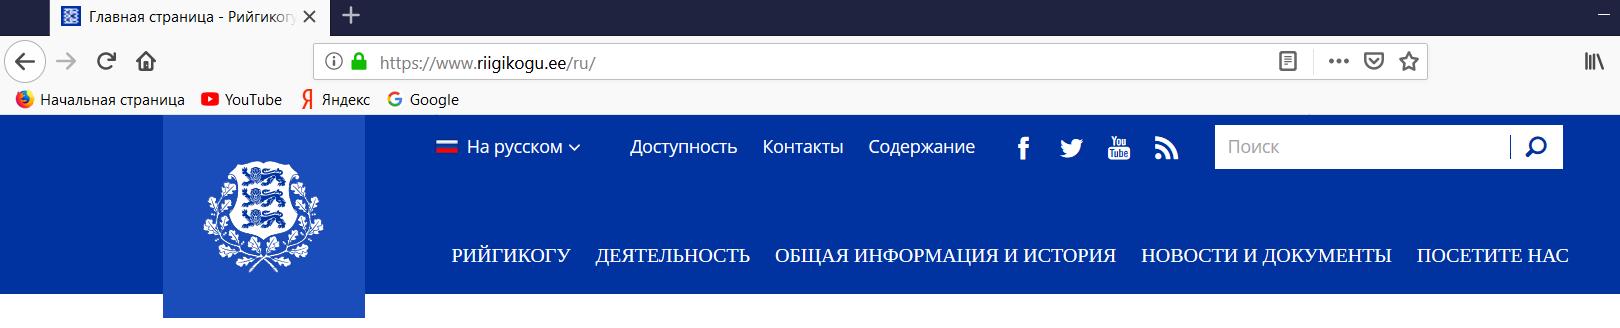 https://i2.imageban.ru/out/2018/12/13/281d64a8d3ef623210d7408ae0b11bc9.png